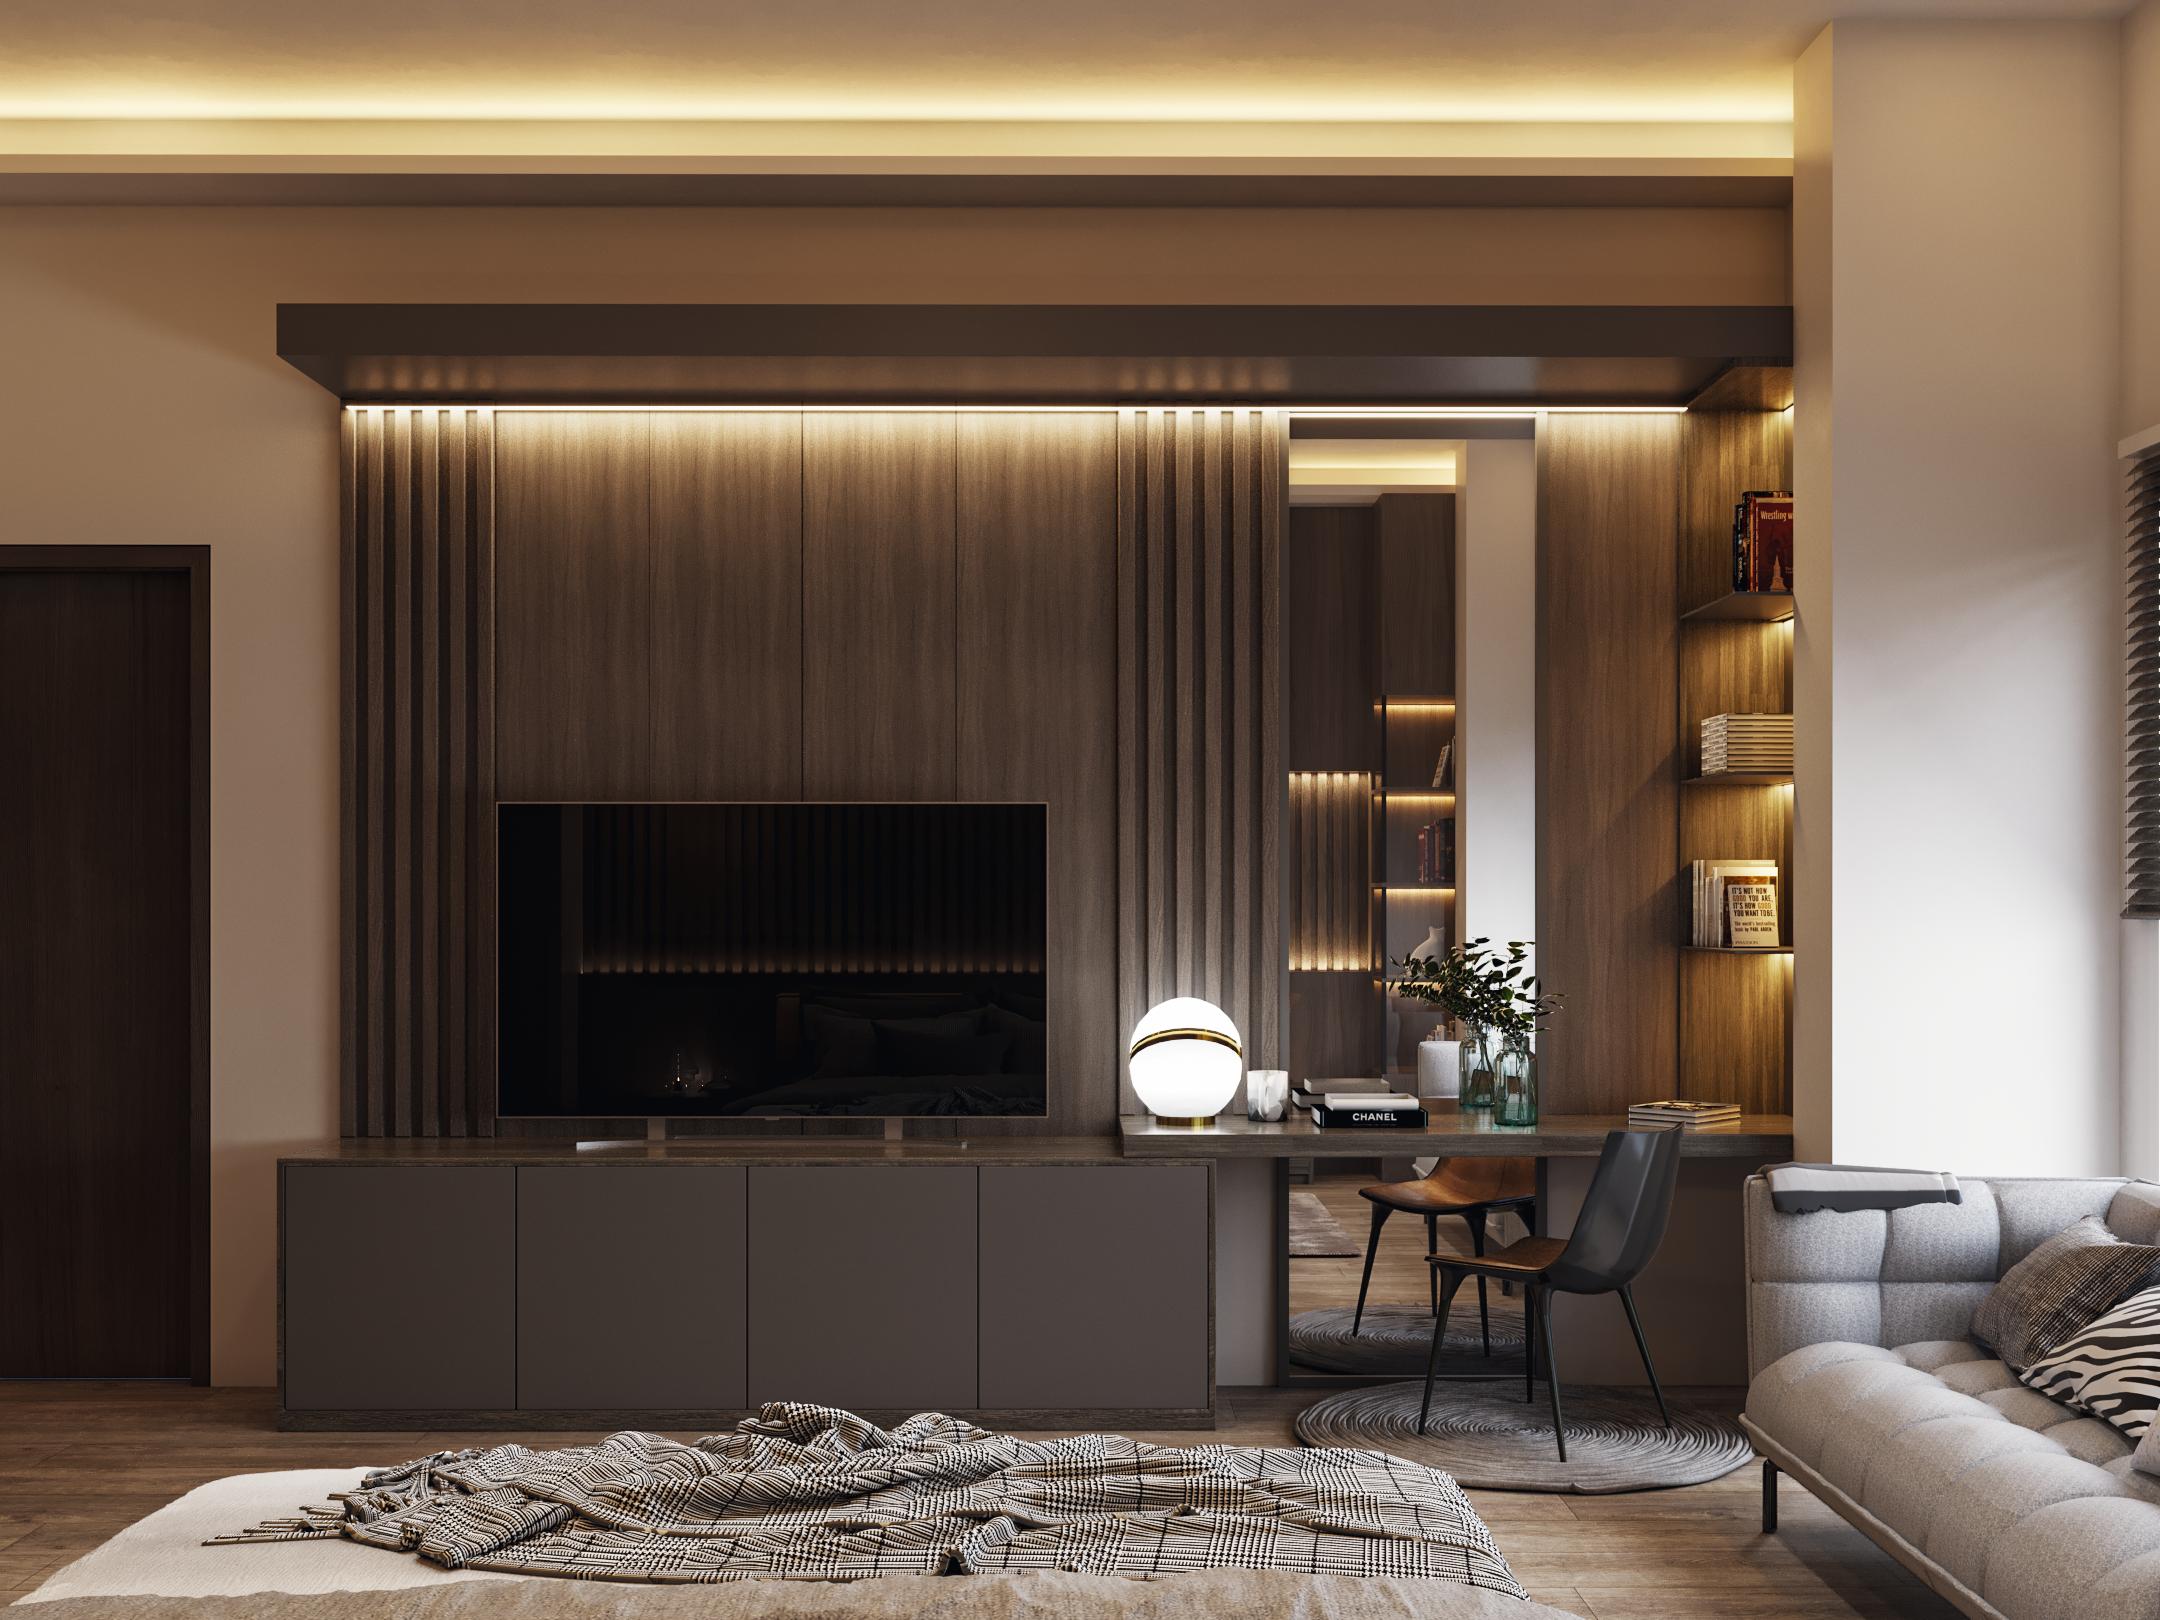 interior kamar tidur modern-kontemporer